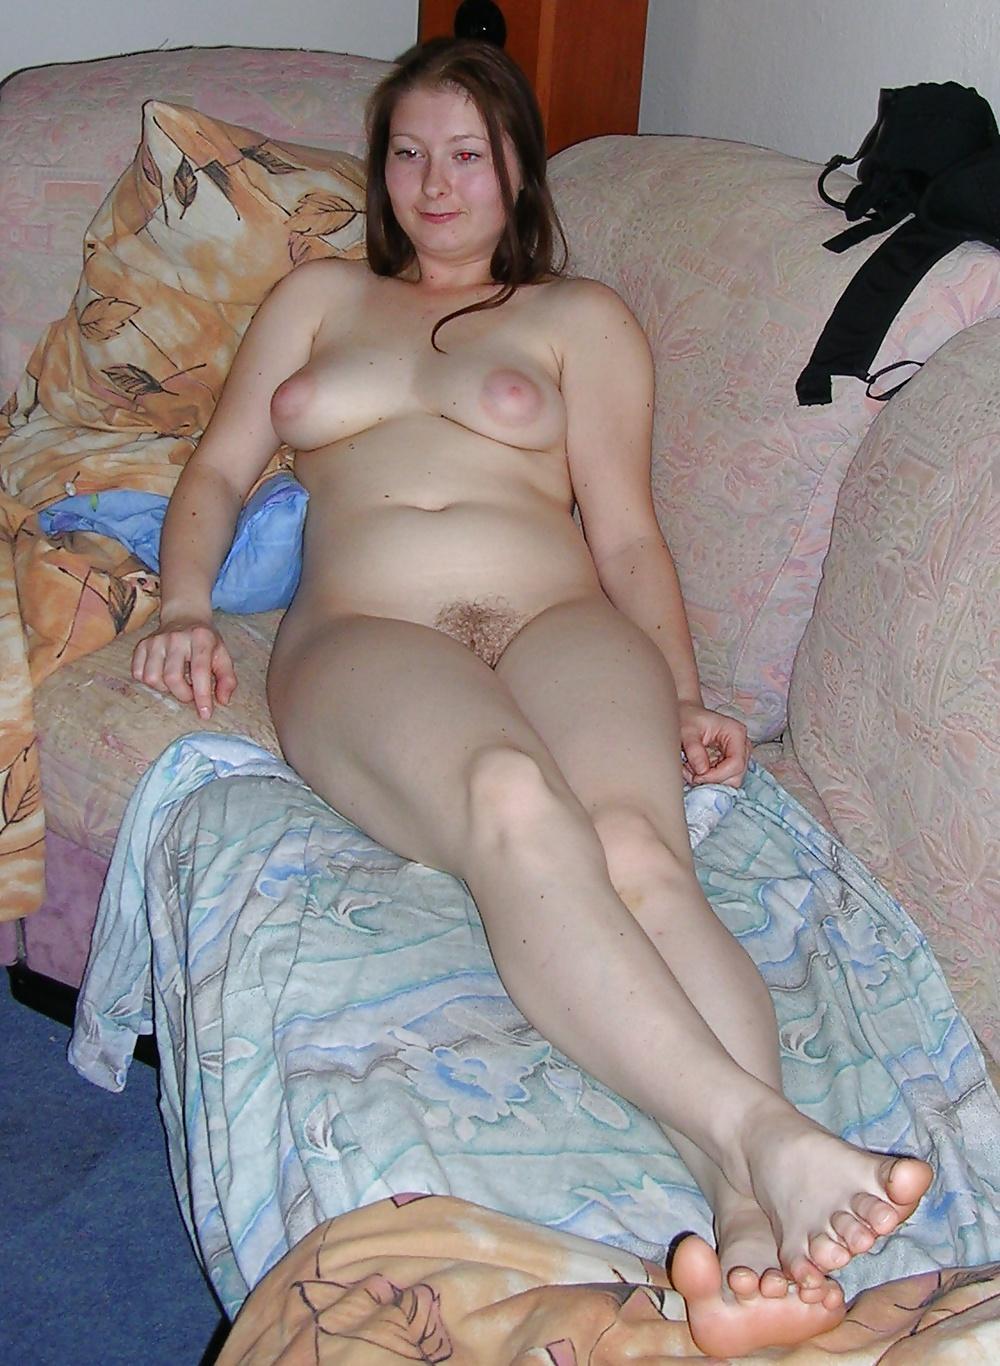 Bondage pics pregnant